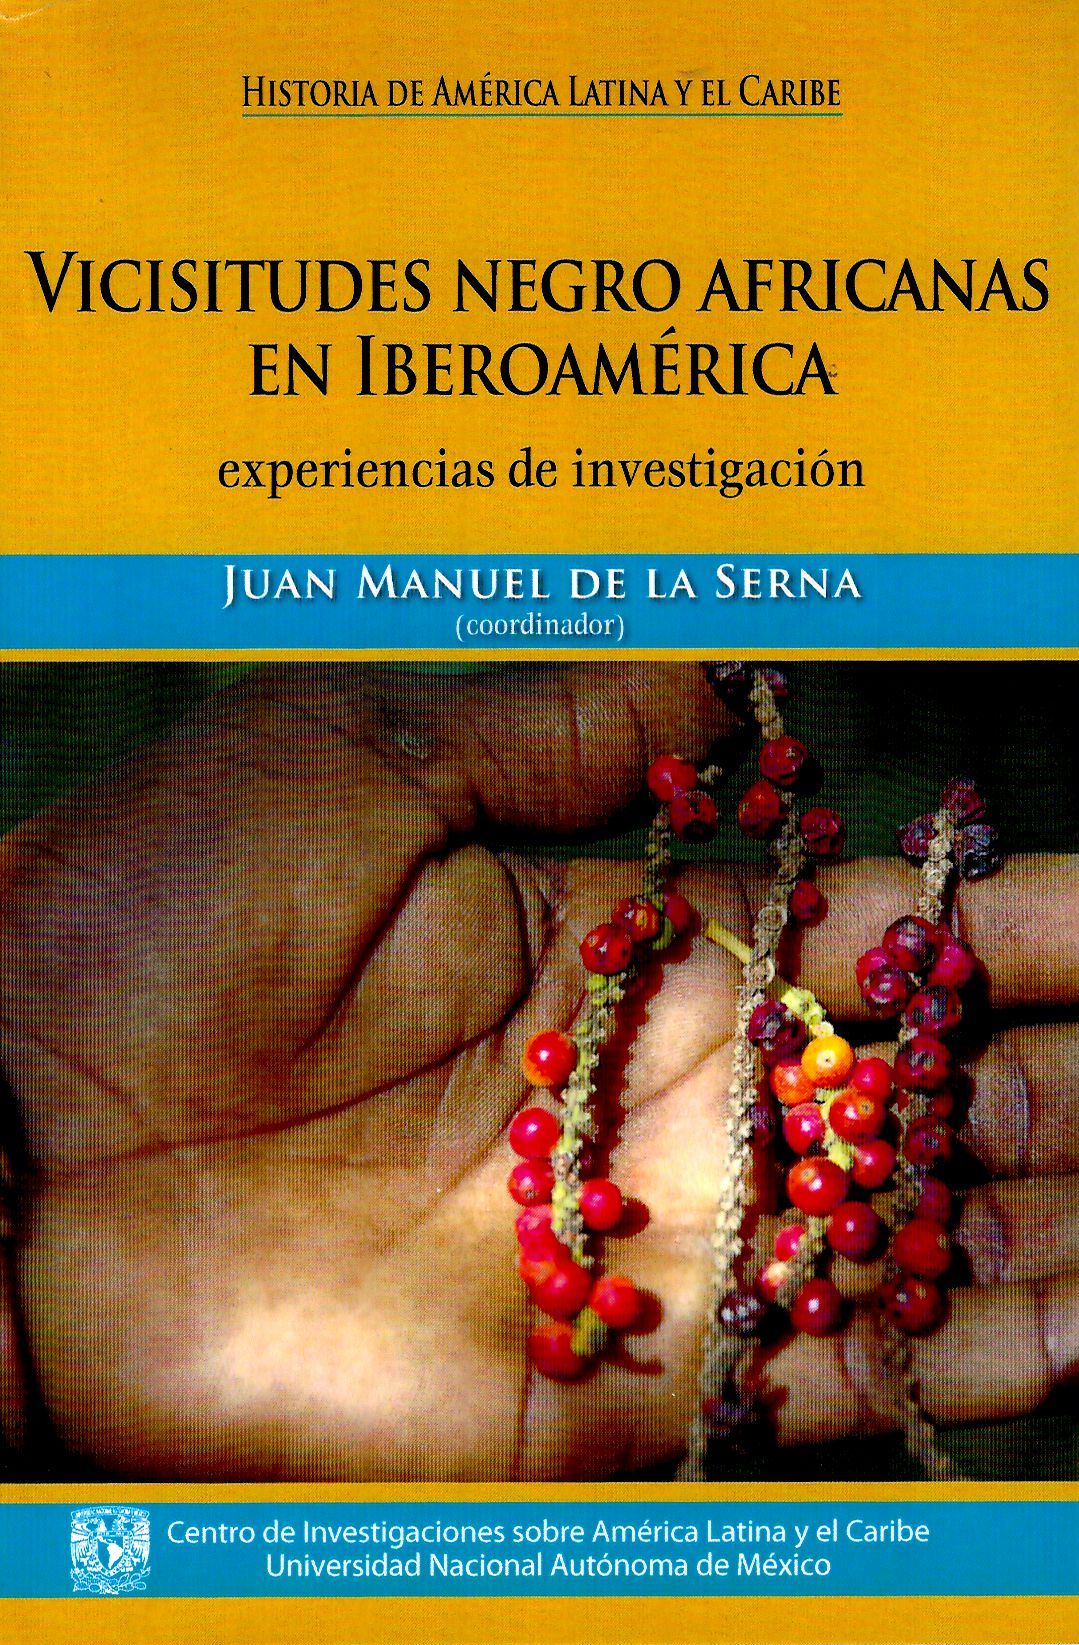 Vicisitudes negro africanas en Iberoamérica. experiencias de investigación